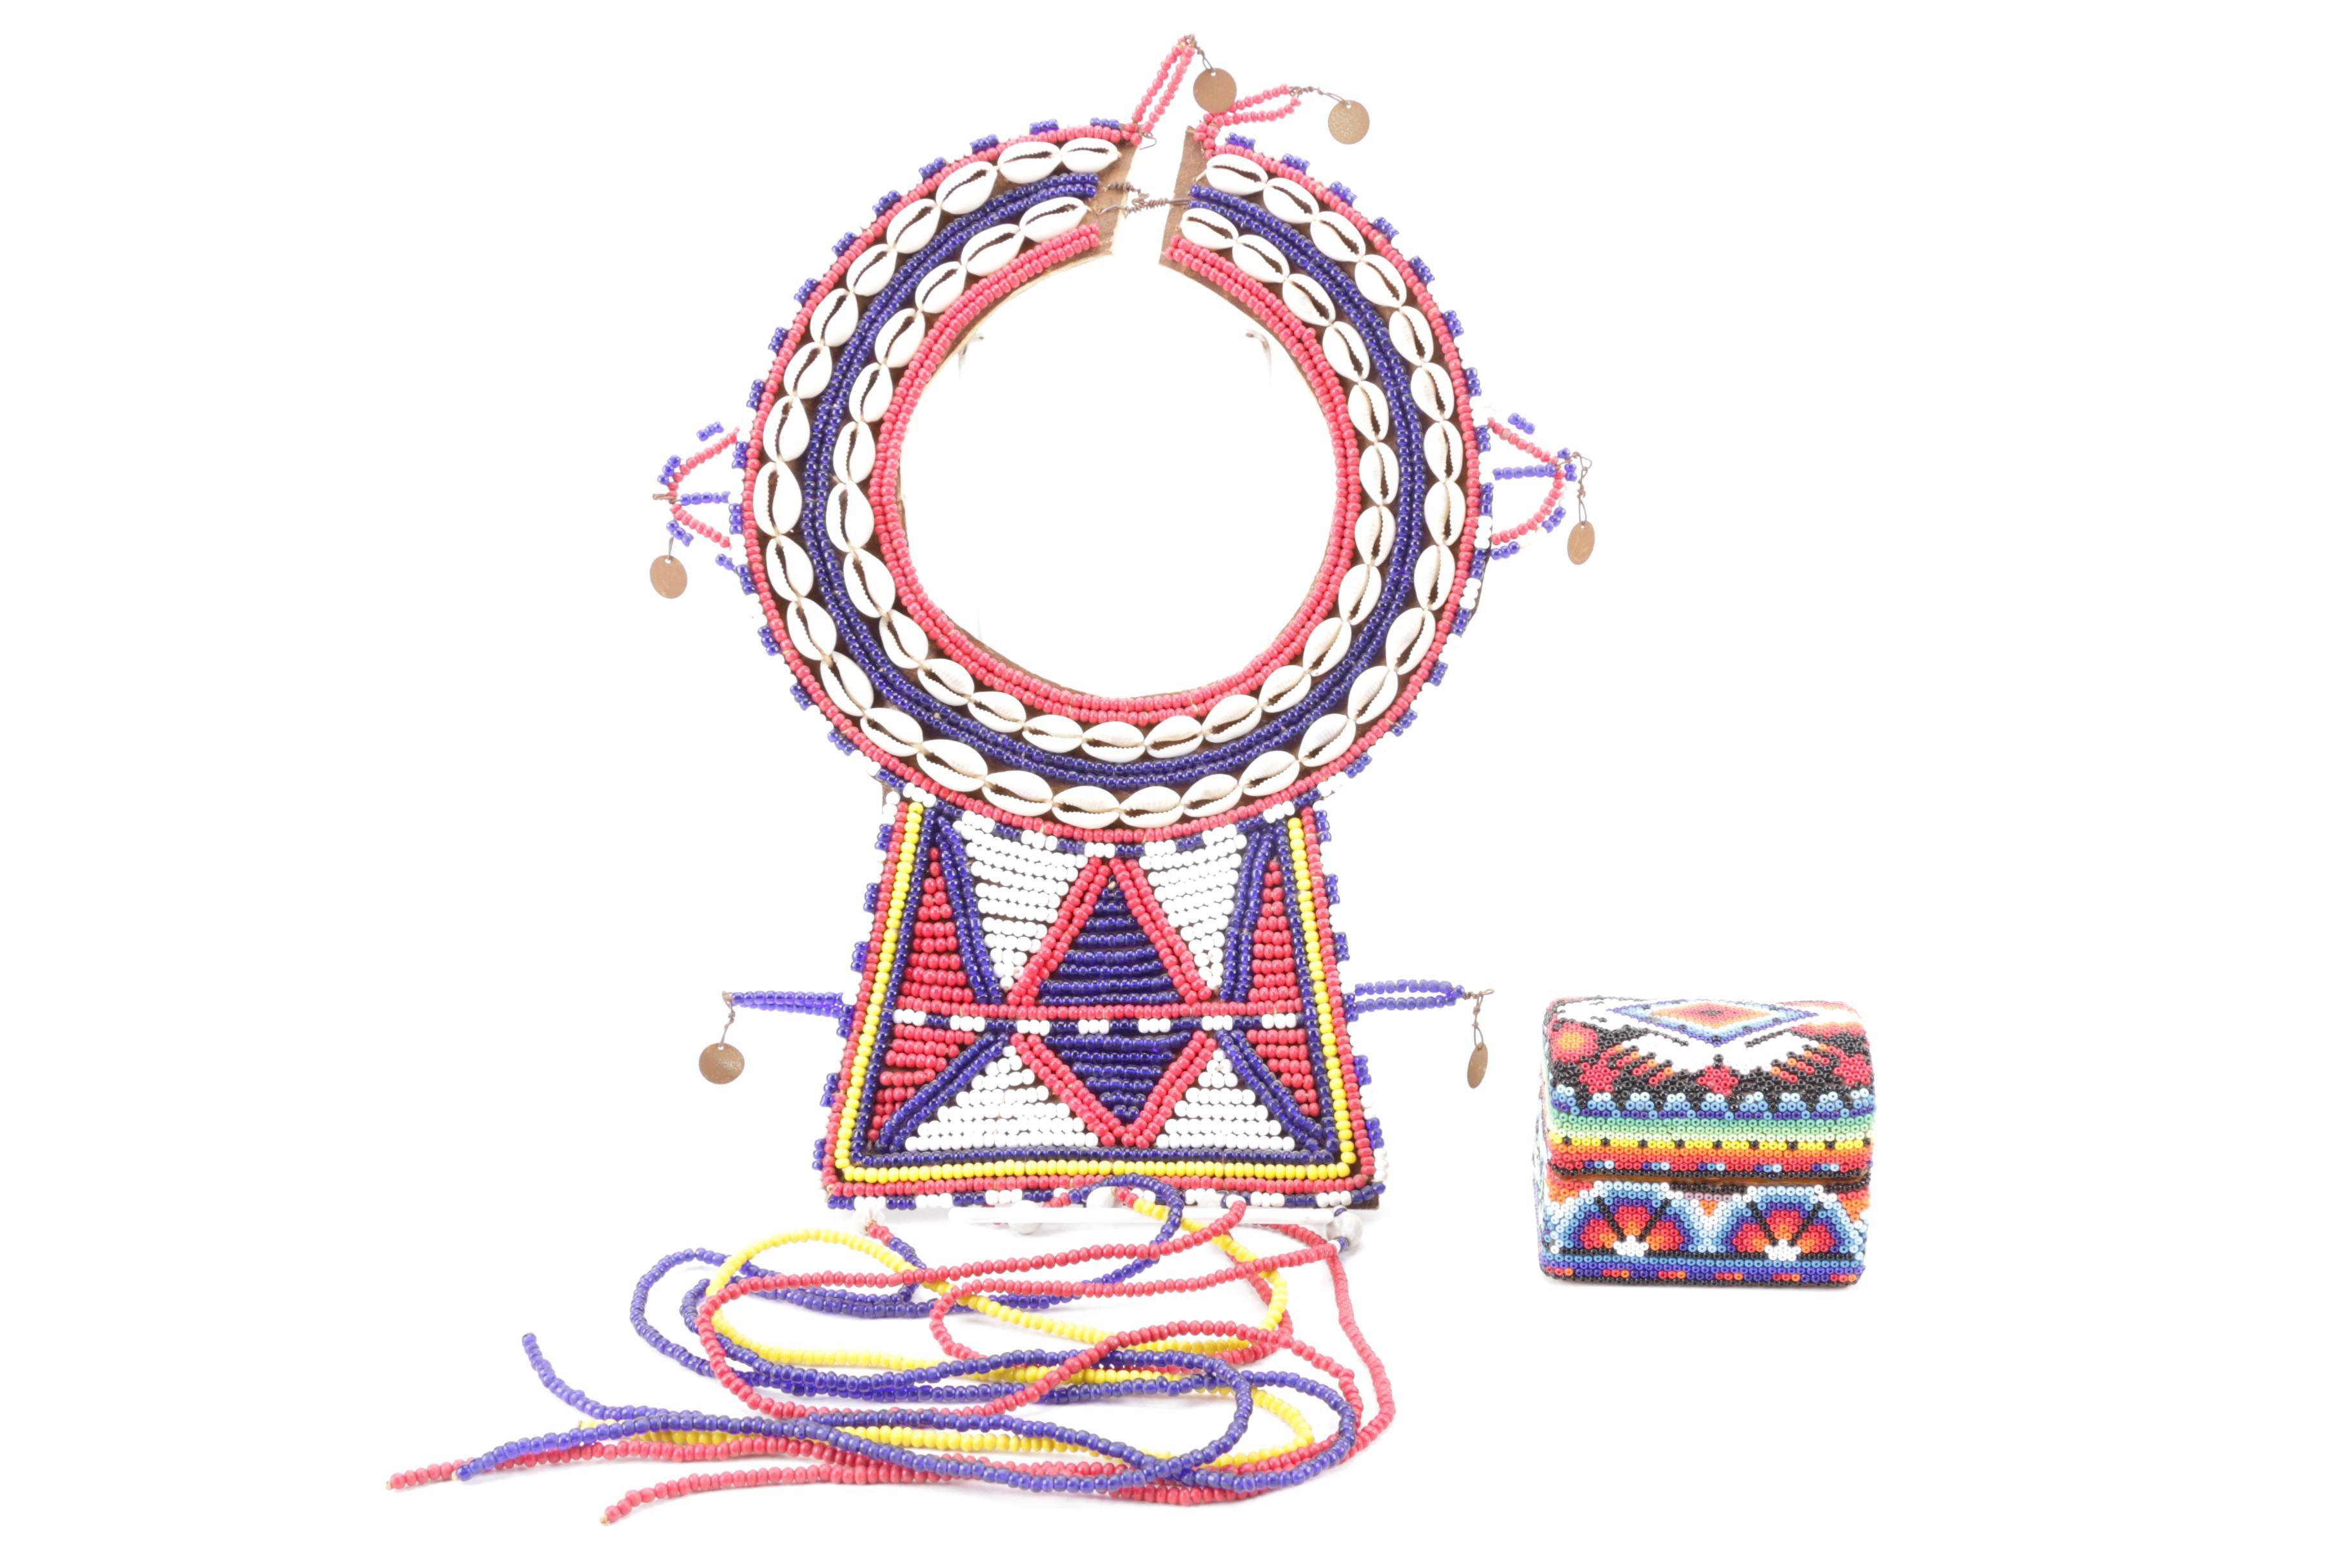 Kenyan Maasai Bead and Cowrie Shell Necklace